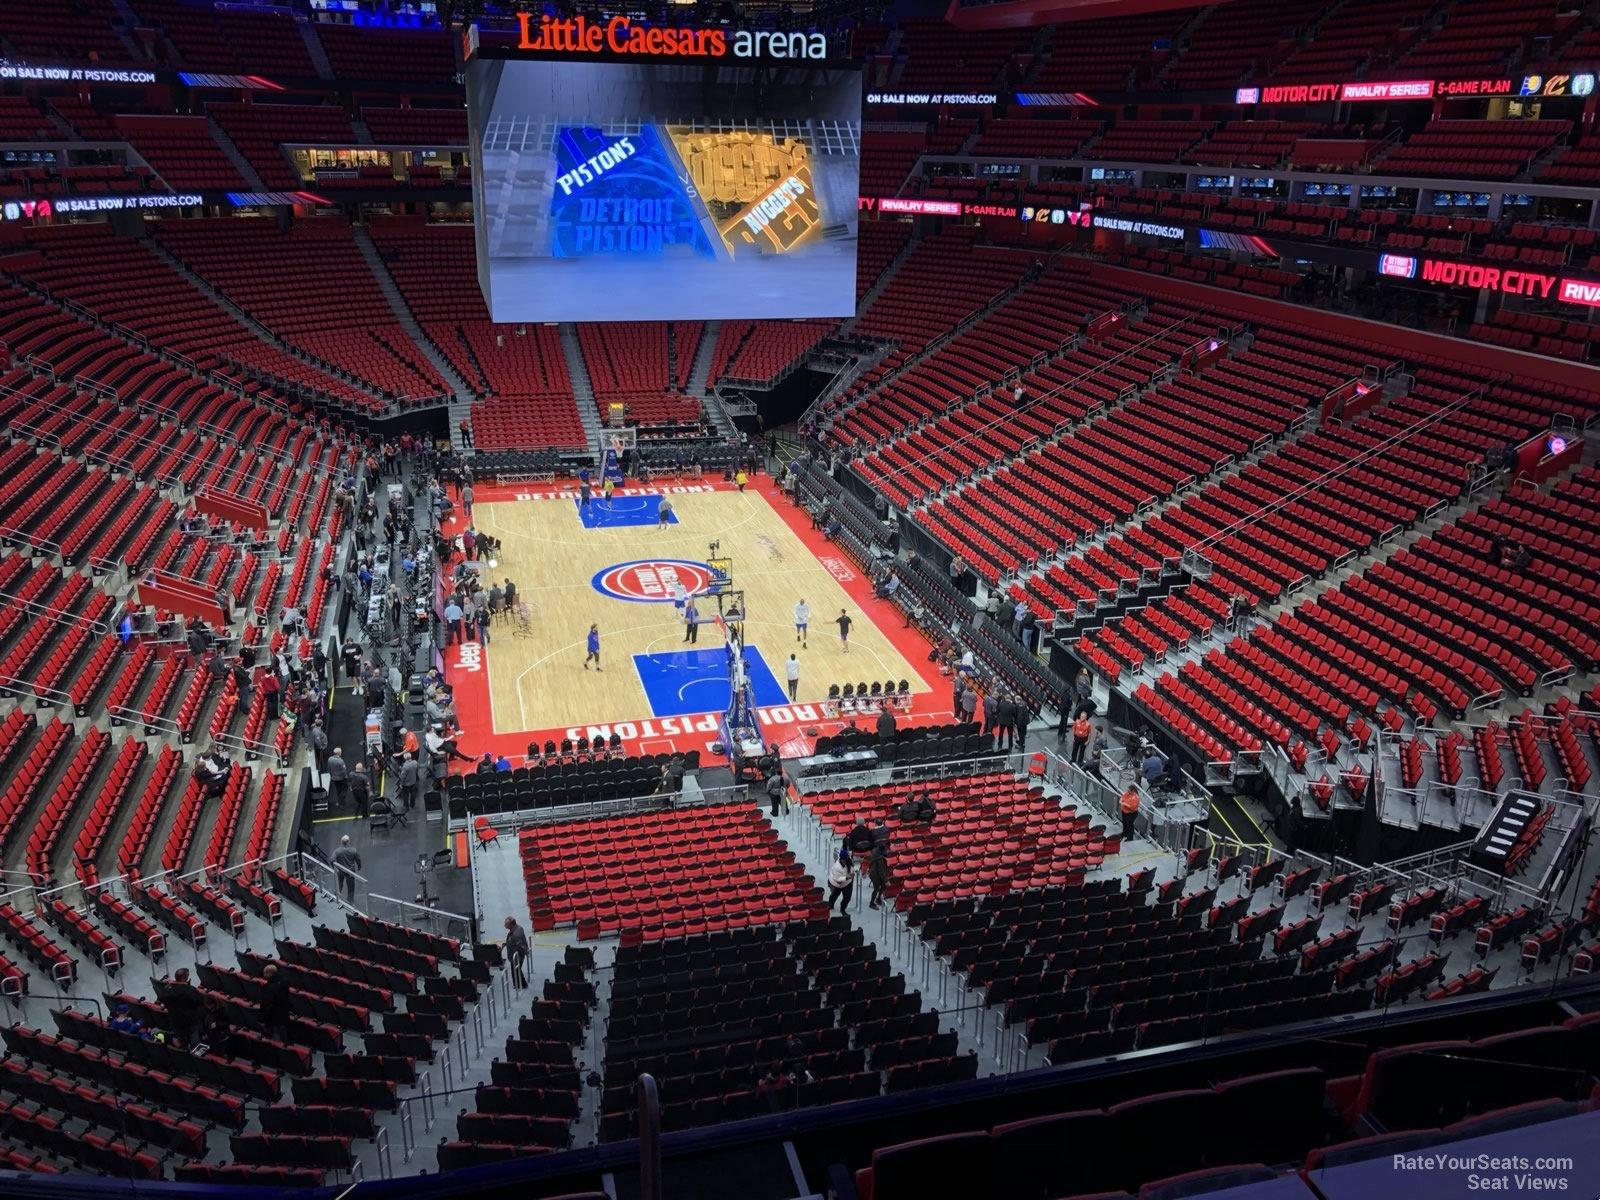 Little Caesars Arena Mezzanine 20 - Detroit Pistons